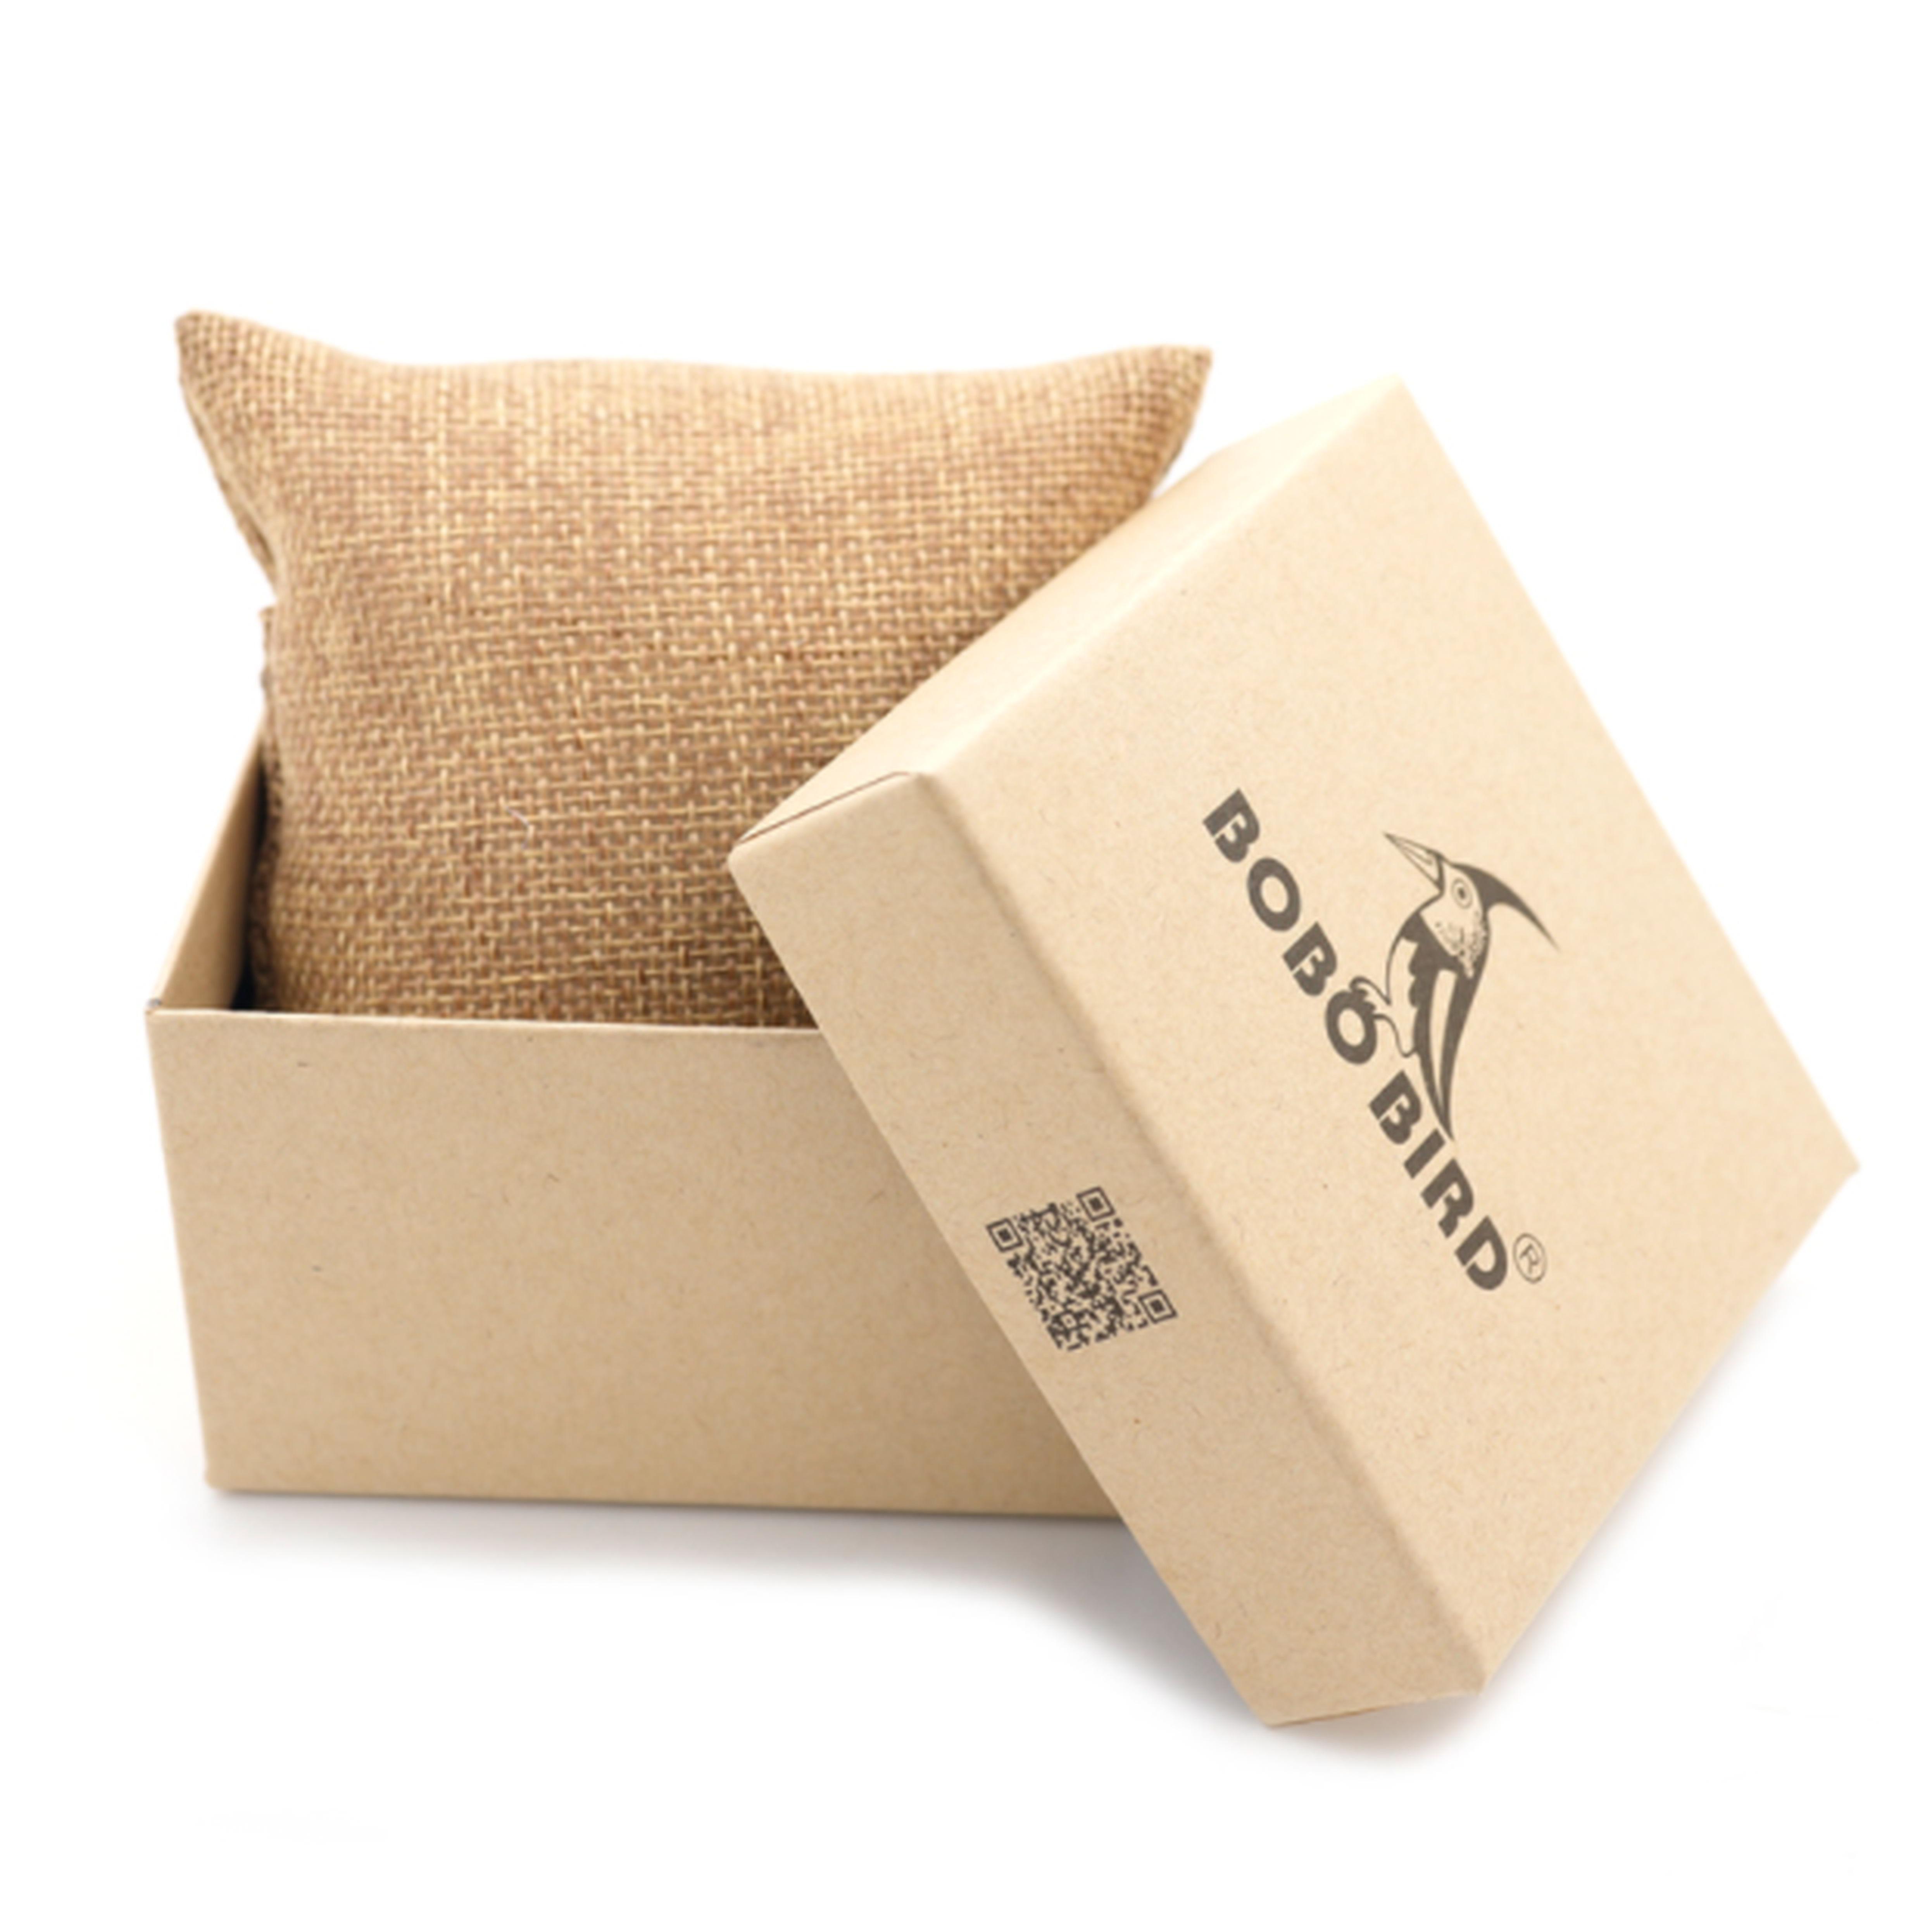 Drewniany zegarek Bobo Bird Premium S08-3 pudełko